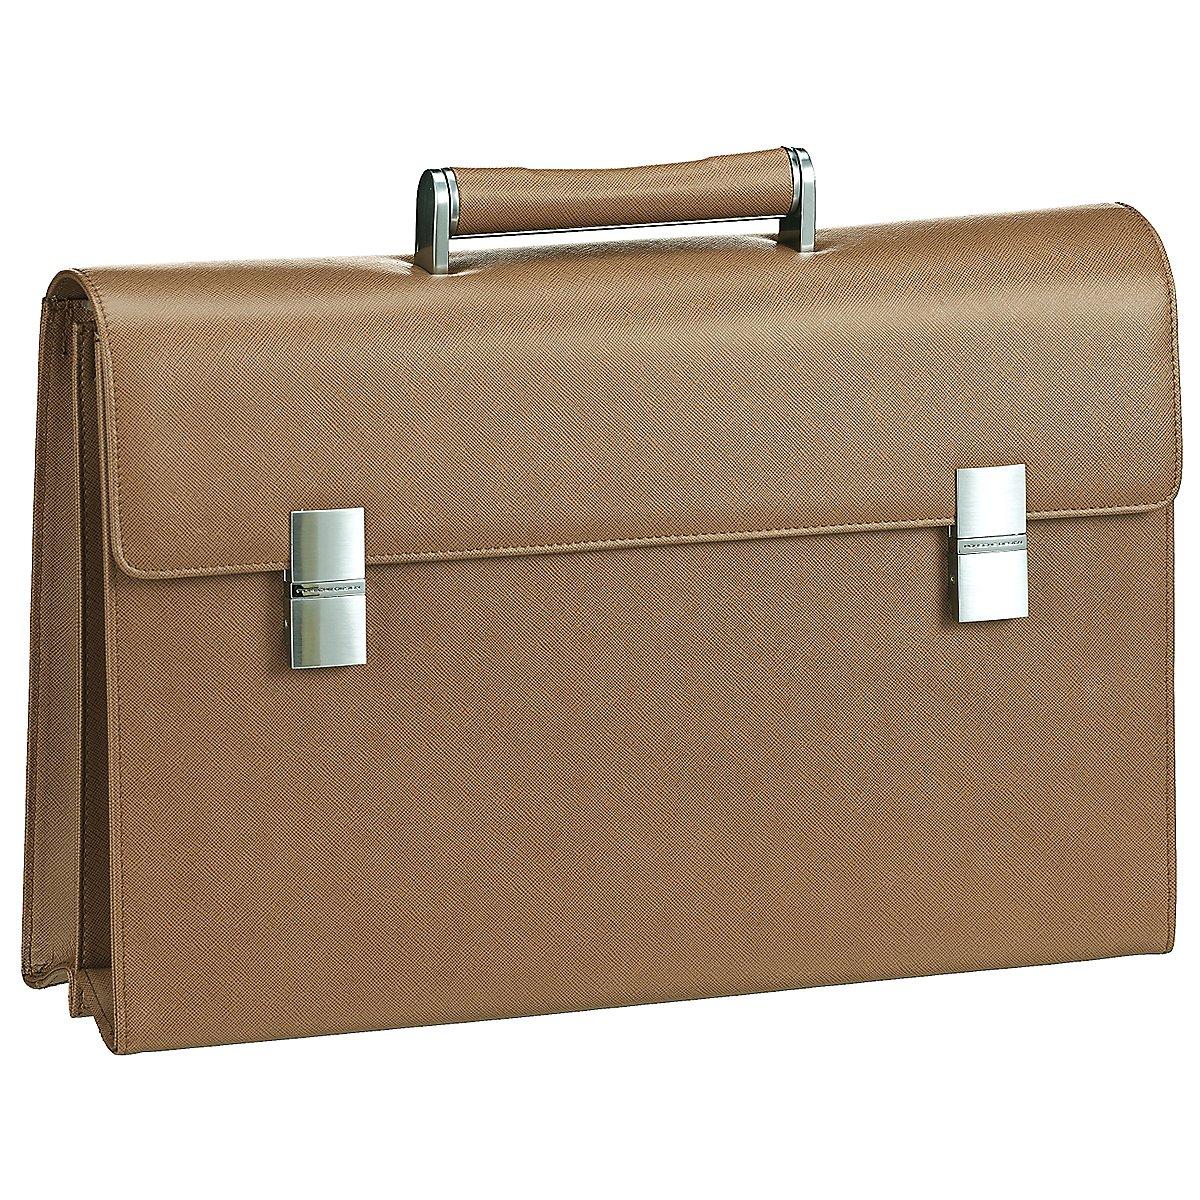 porsche design saffiano briefbag fm aktentasche 43 cm. Black Bedroom Furniture Sets. Home Design Ideas